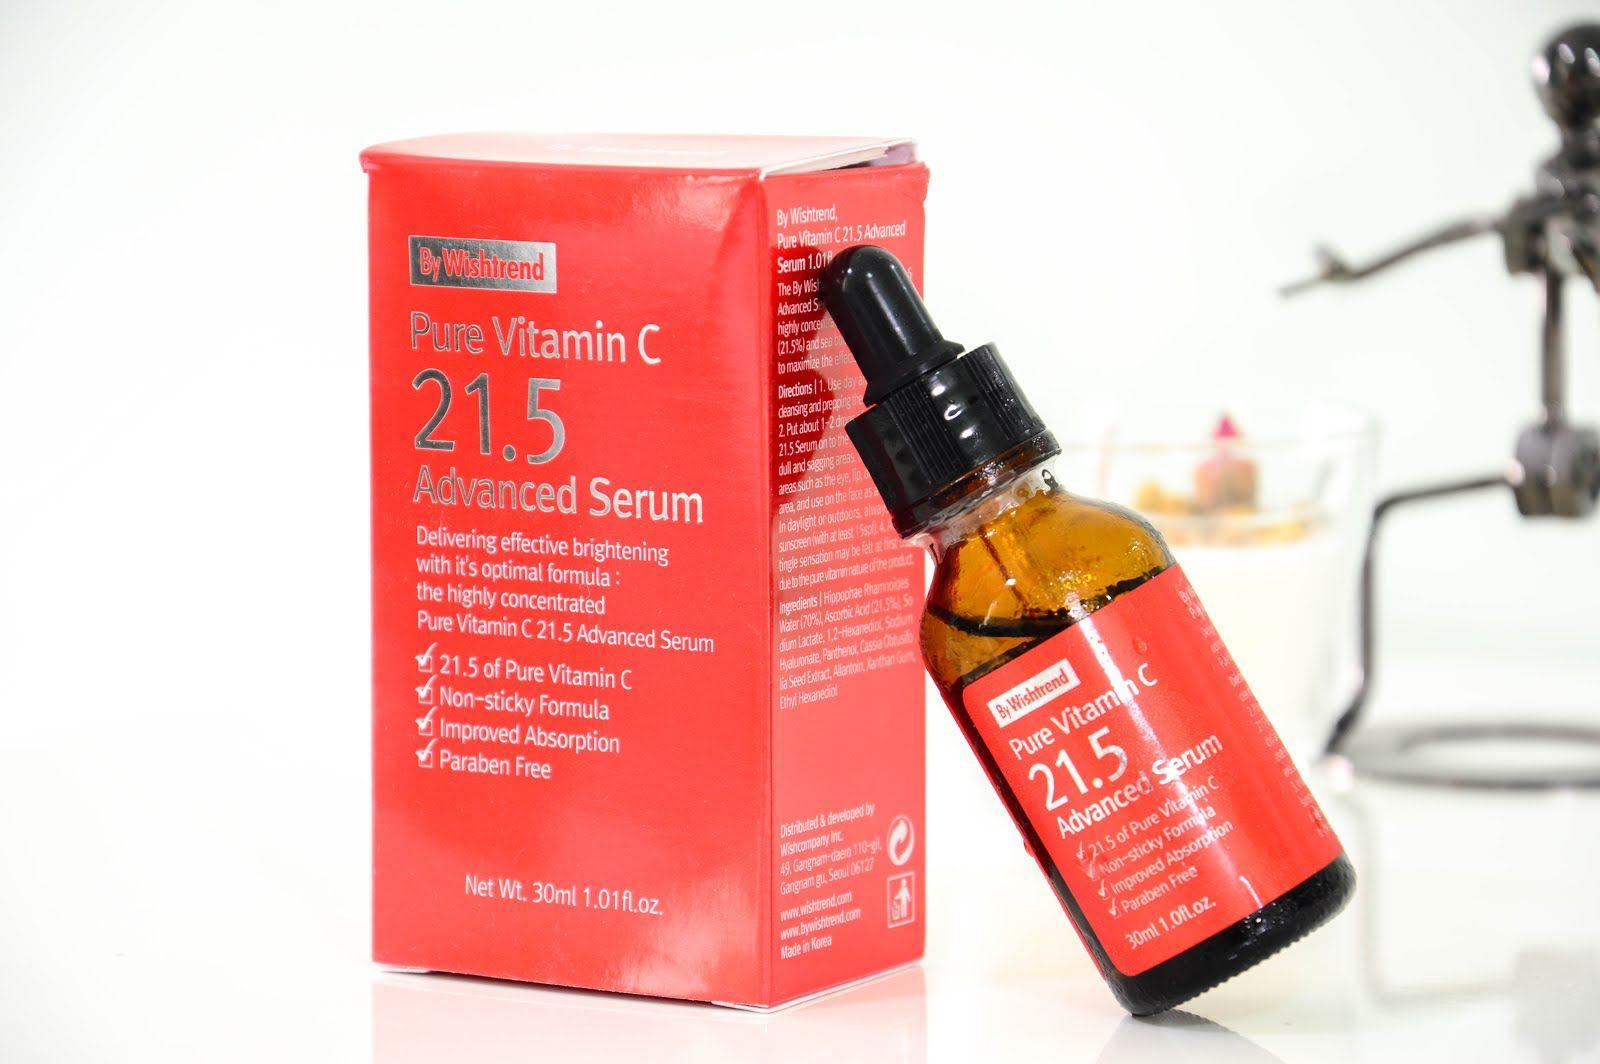 REVIEW By Wishtrend Pure Vitamin C 21.5 Advanced Serum